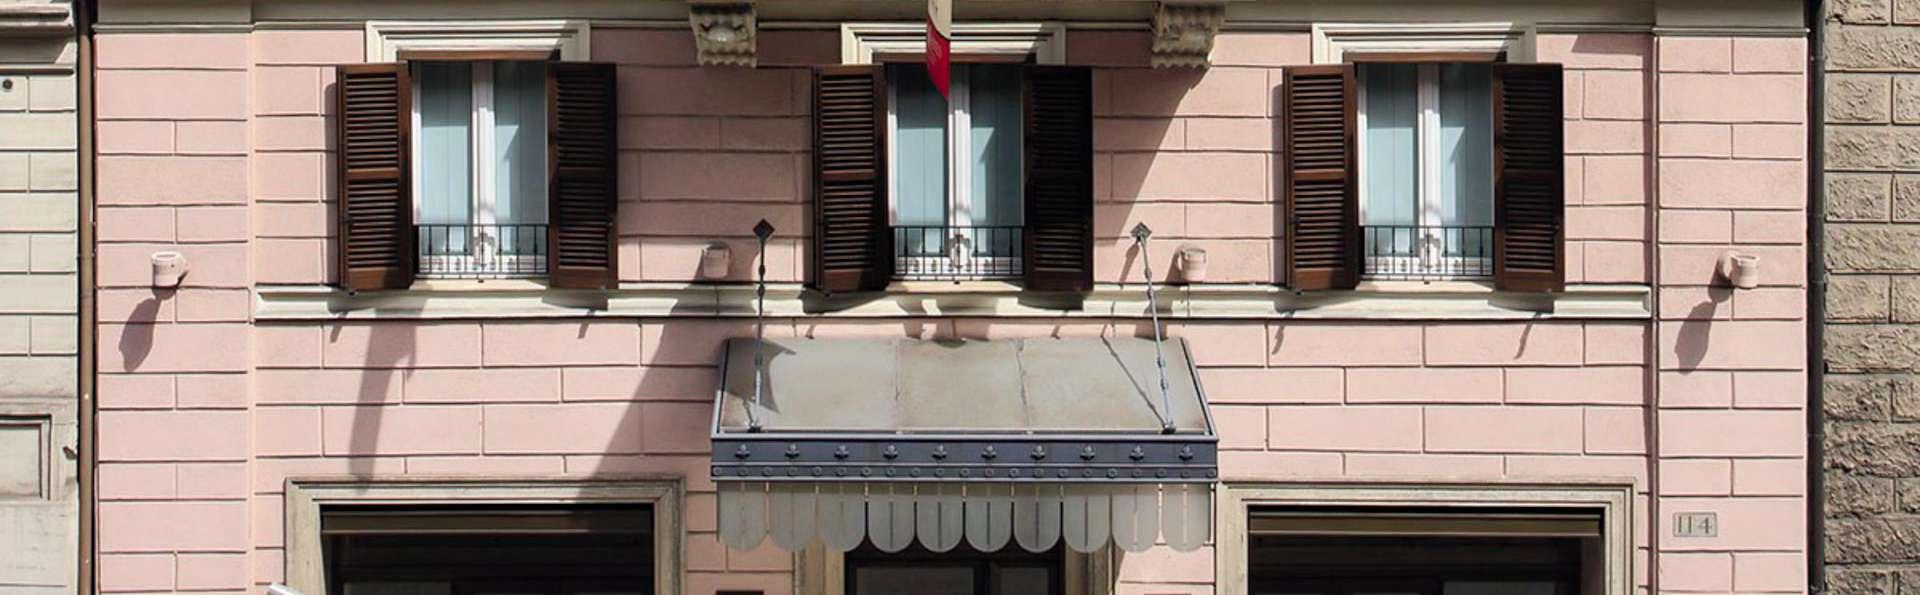 Hotel Stendhal - EDIT_FRONT_01.jpg